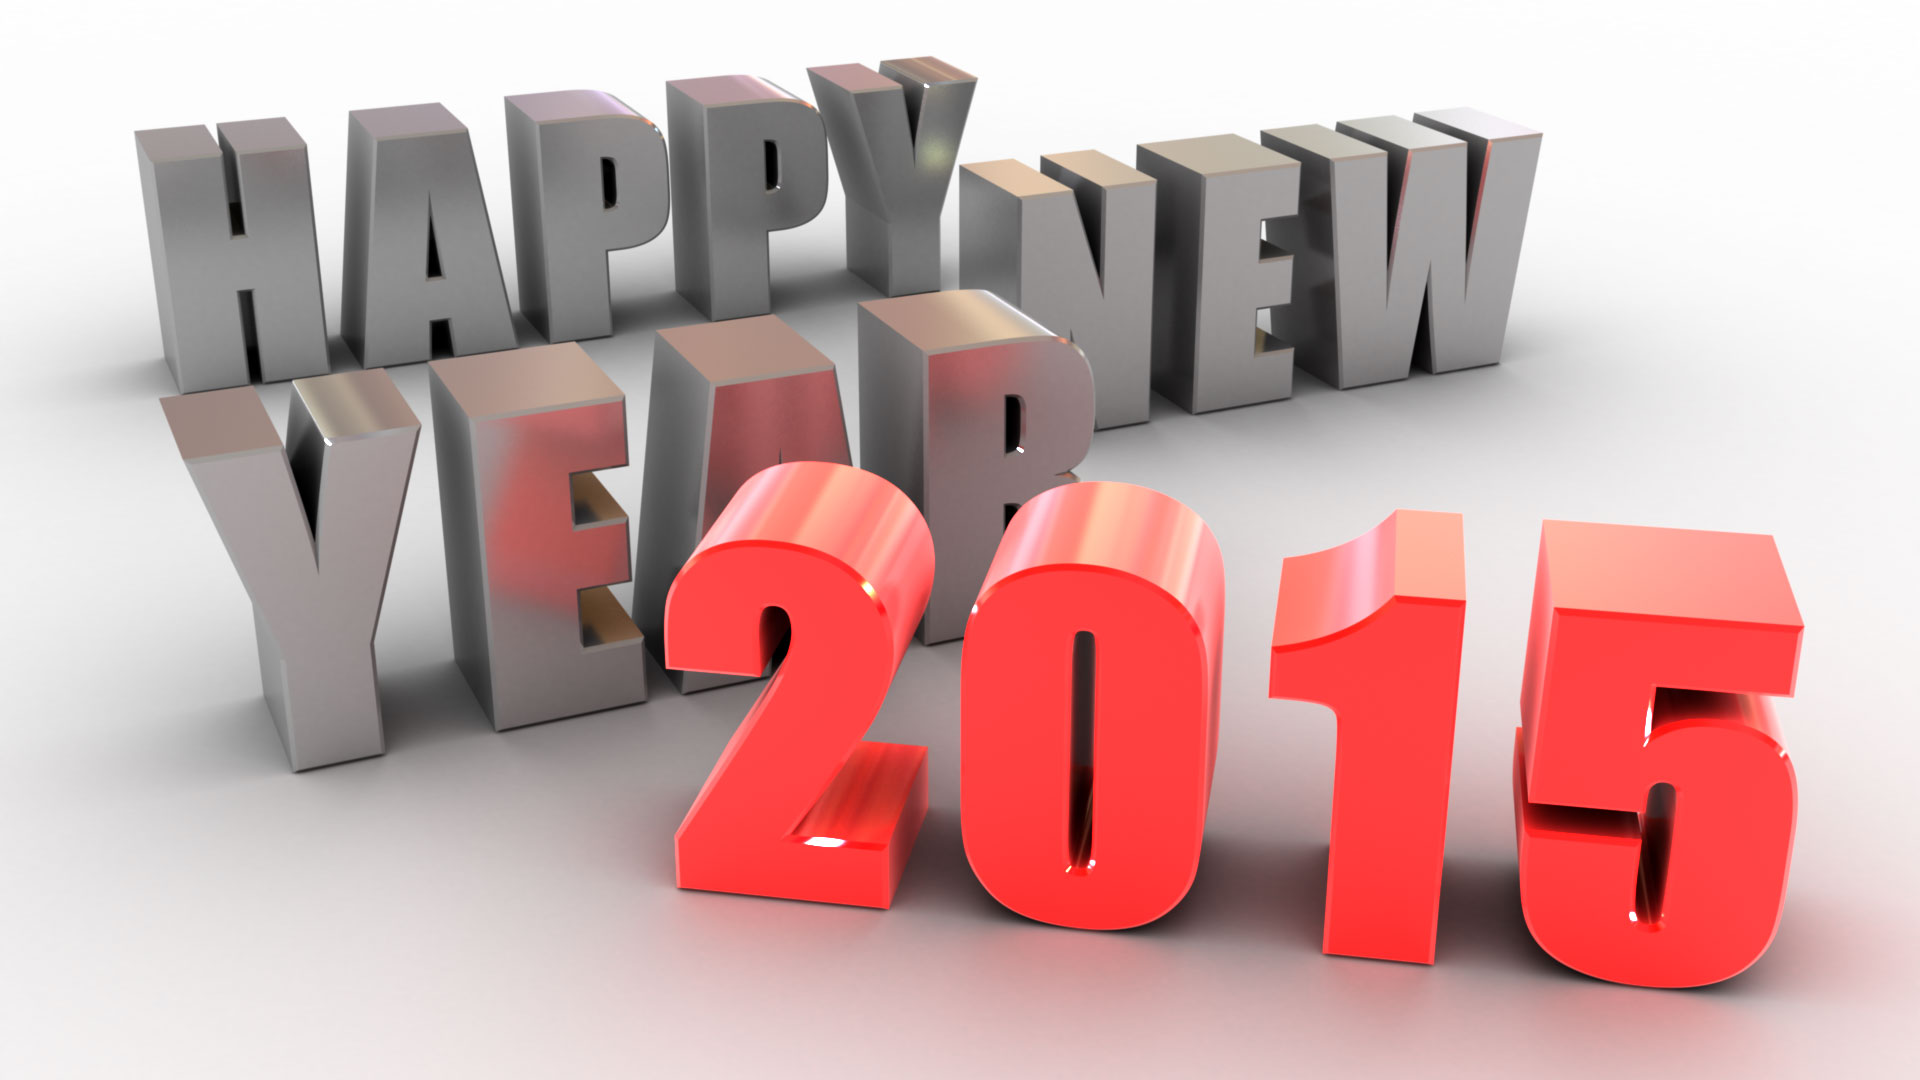 Happy New Year Wallpaper 1920x1080